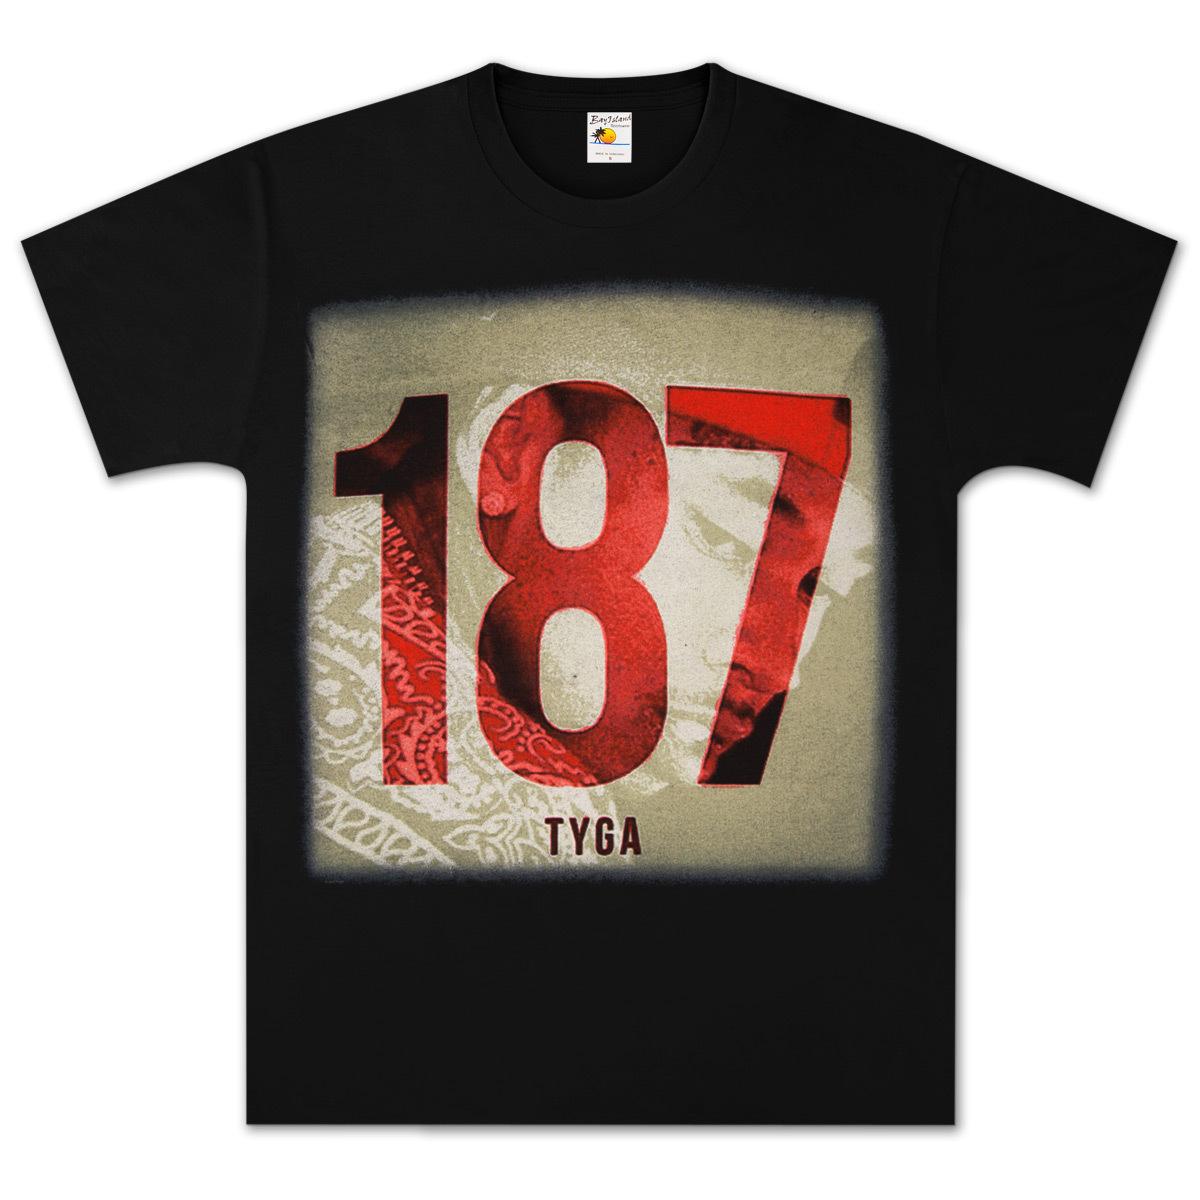 tyga 187 bandana t shirt shop the bravado superstore. Black Bedroom Furniture Sets. Home Design Ideas